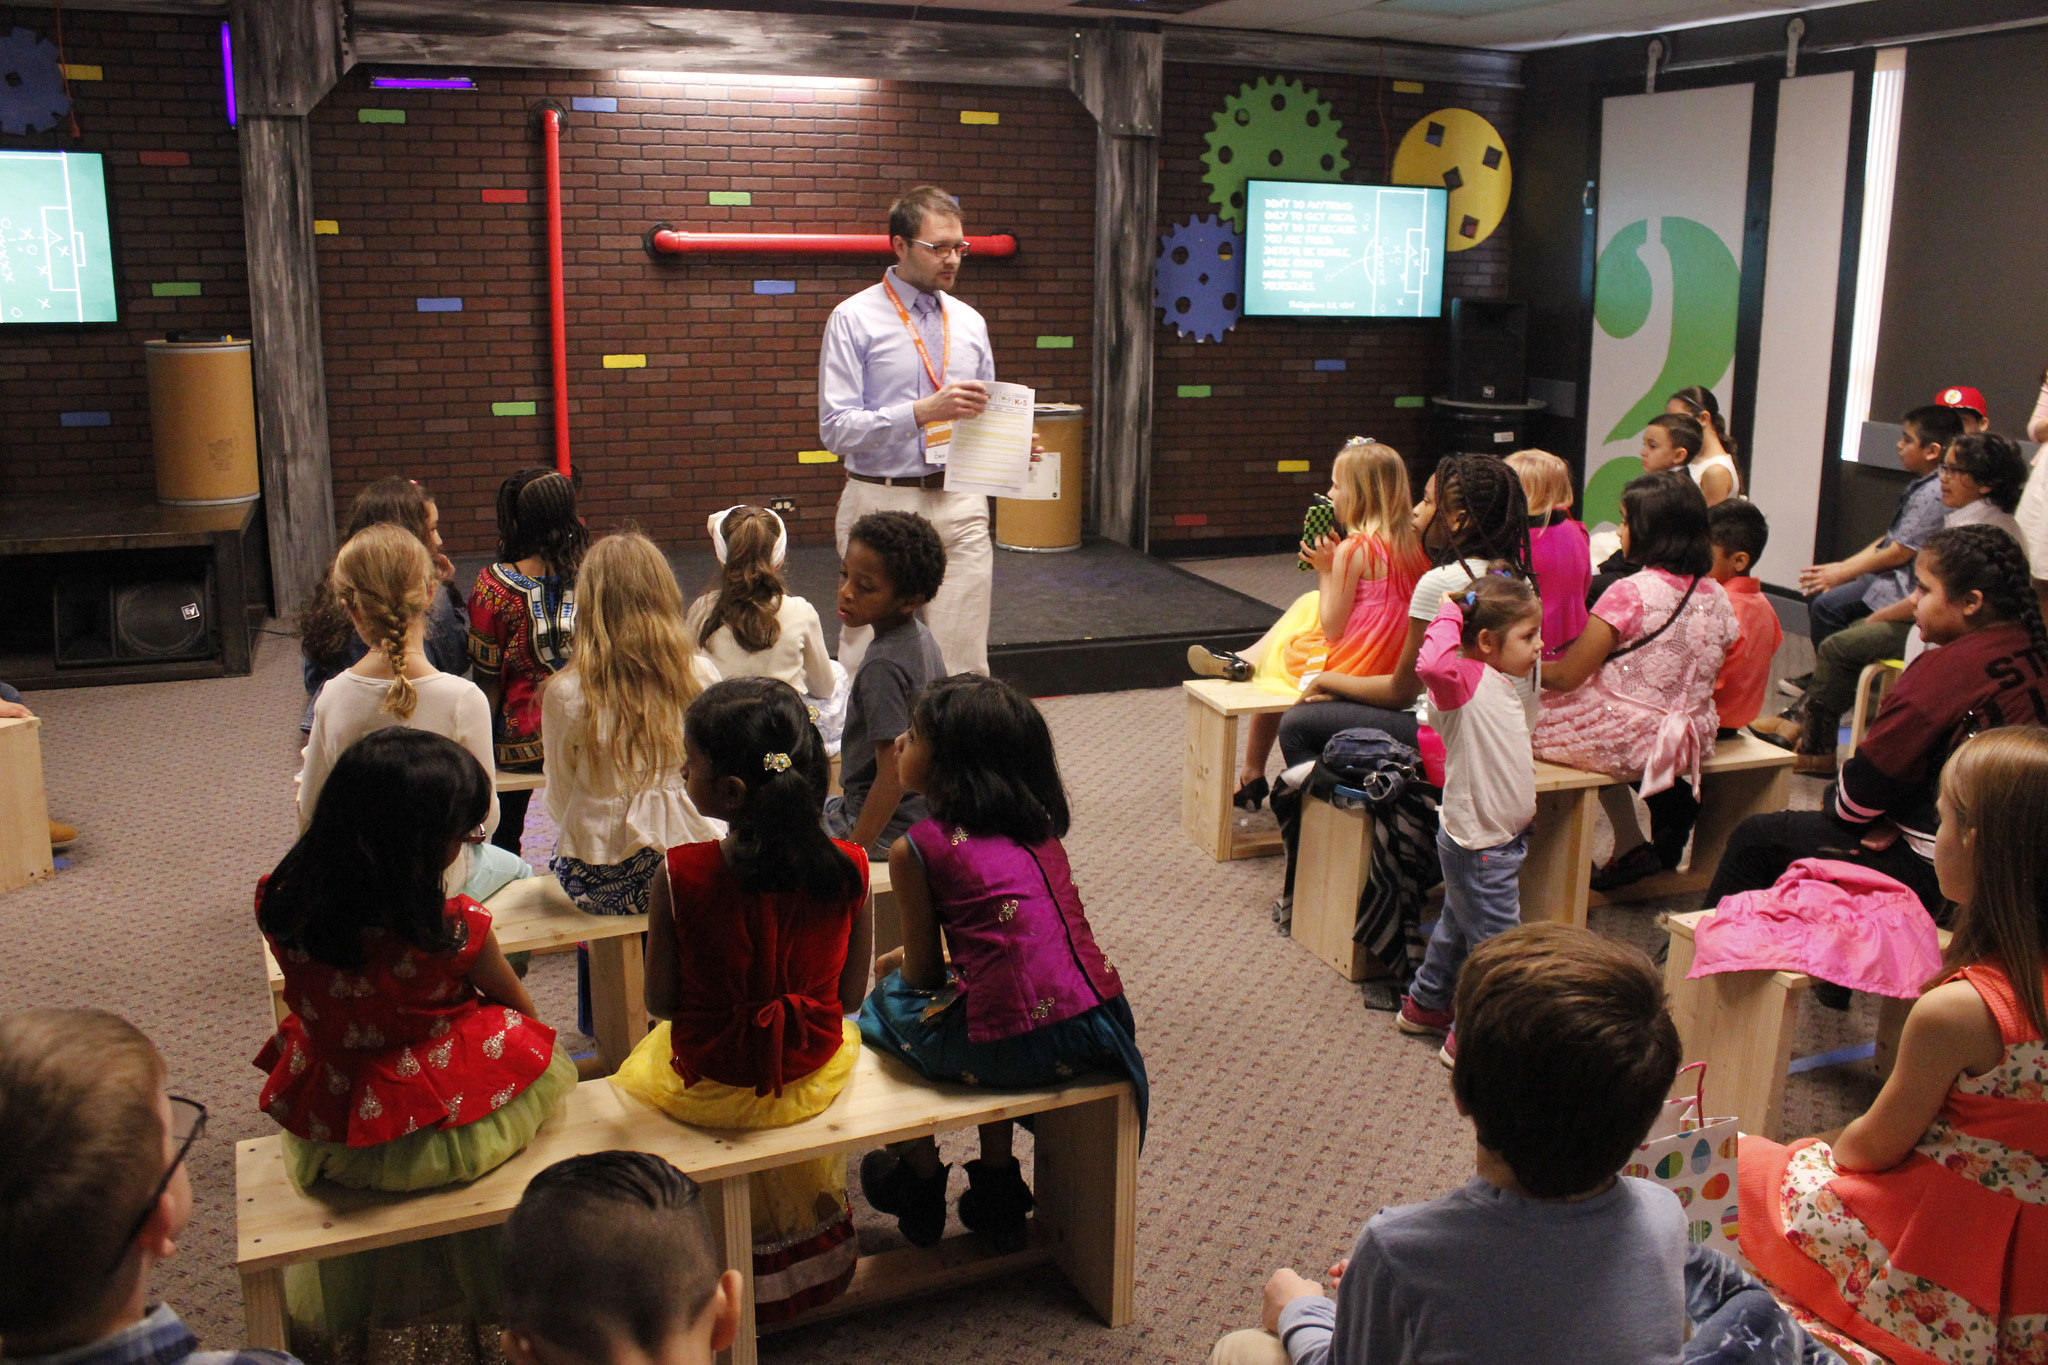 Elementary - Kindergarten to 5th grade